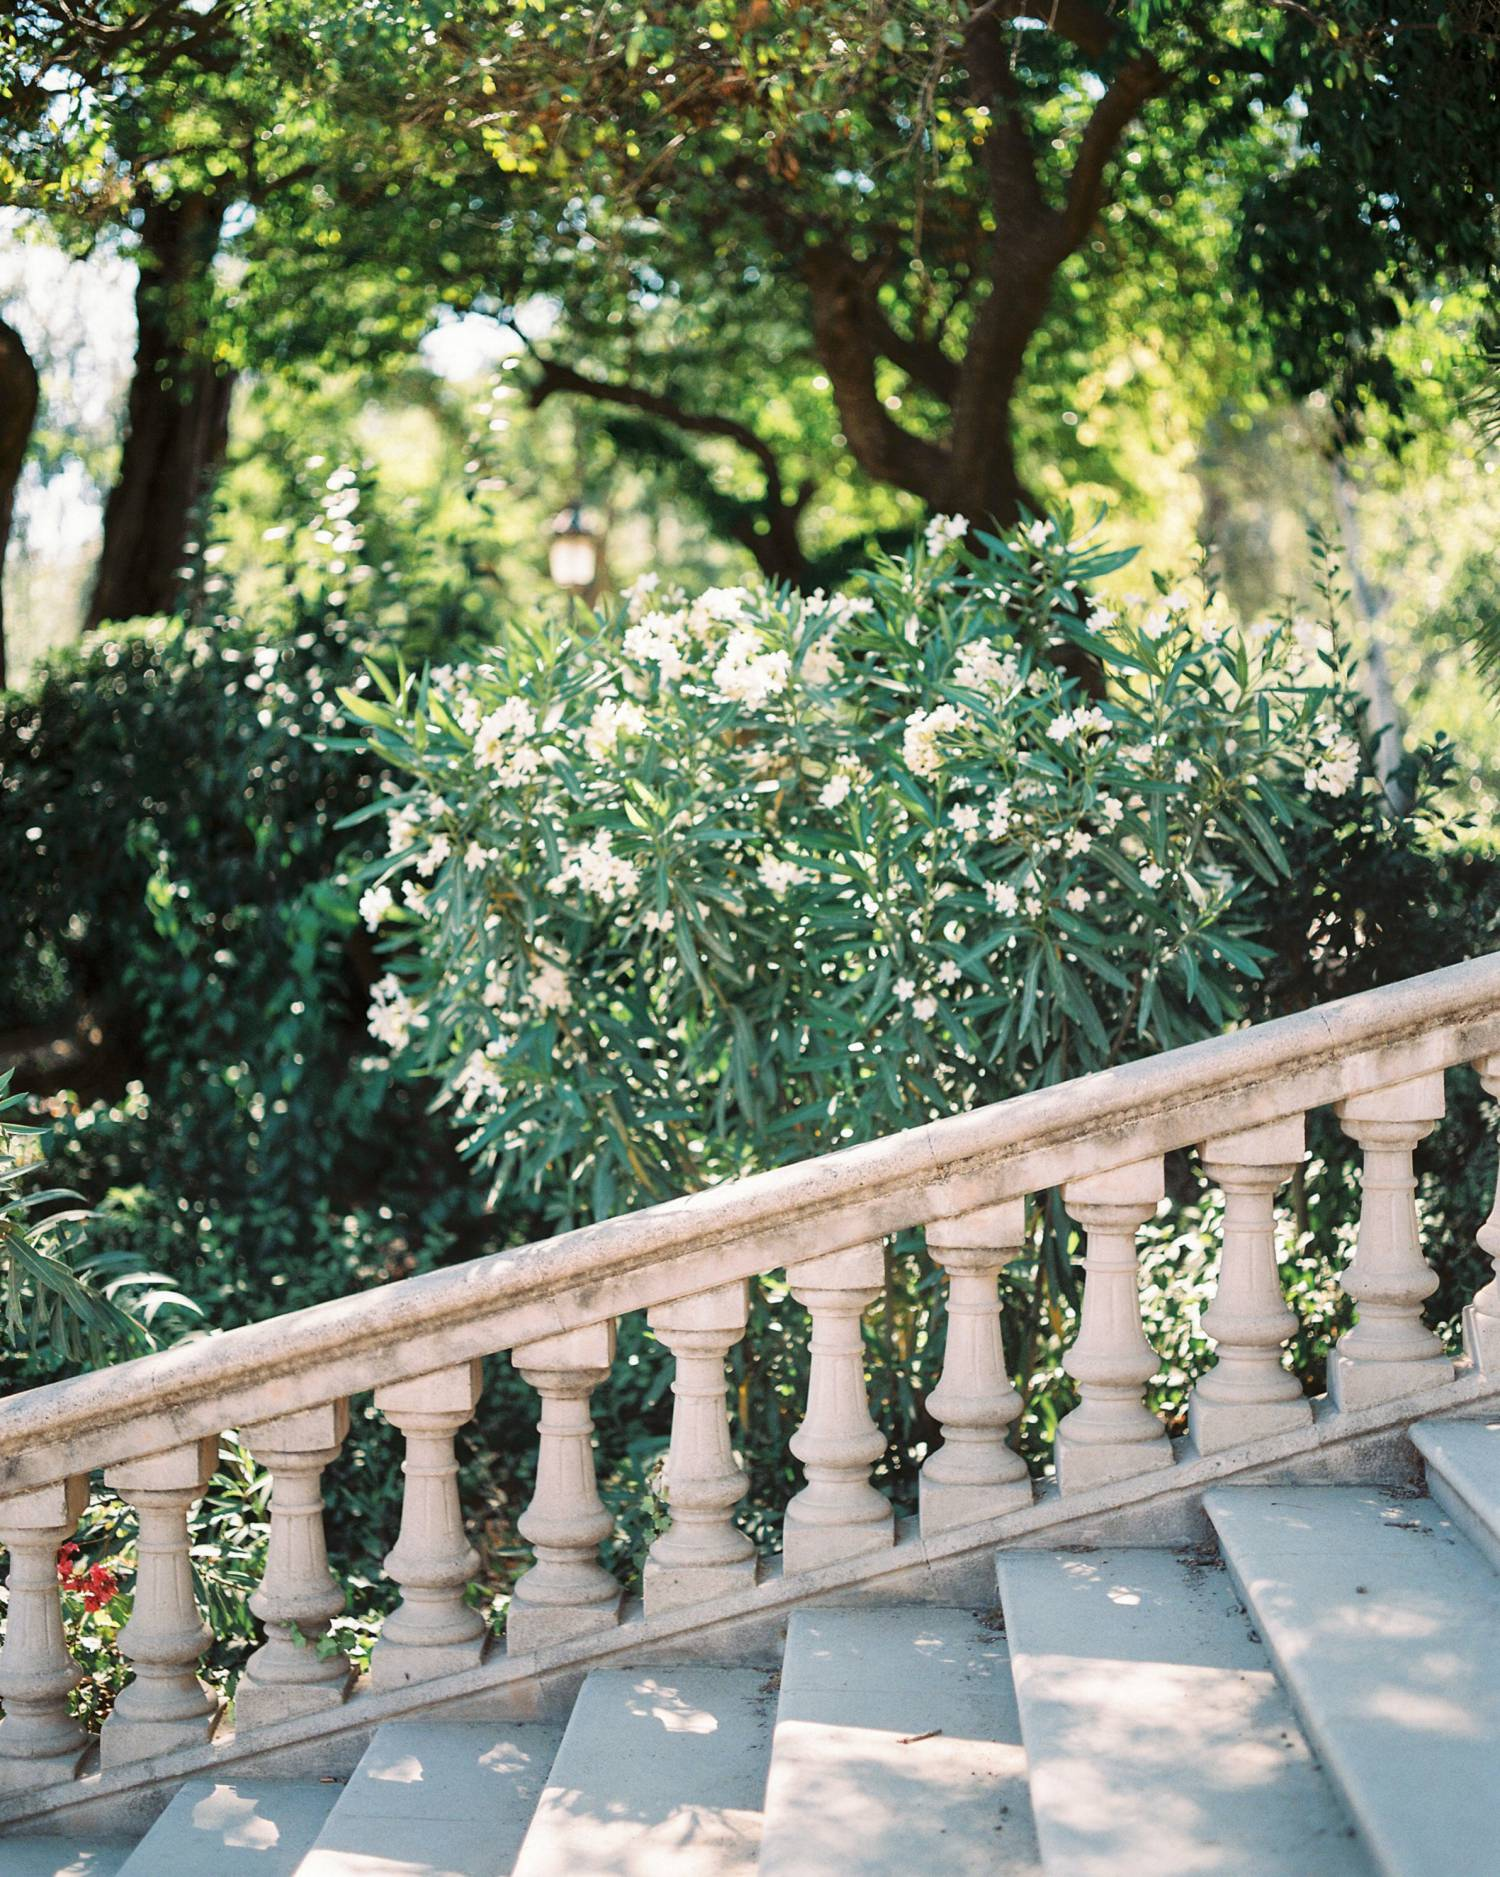 Barcelona film photography ciutadella parc stairs